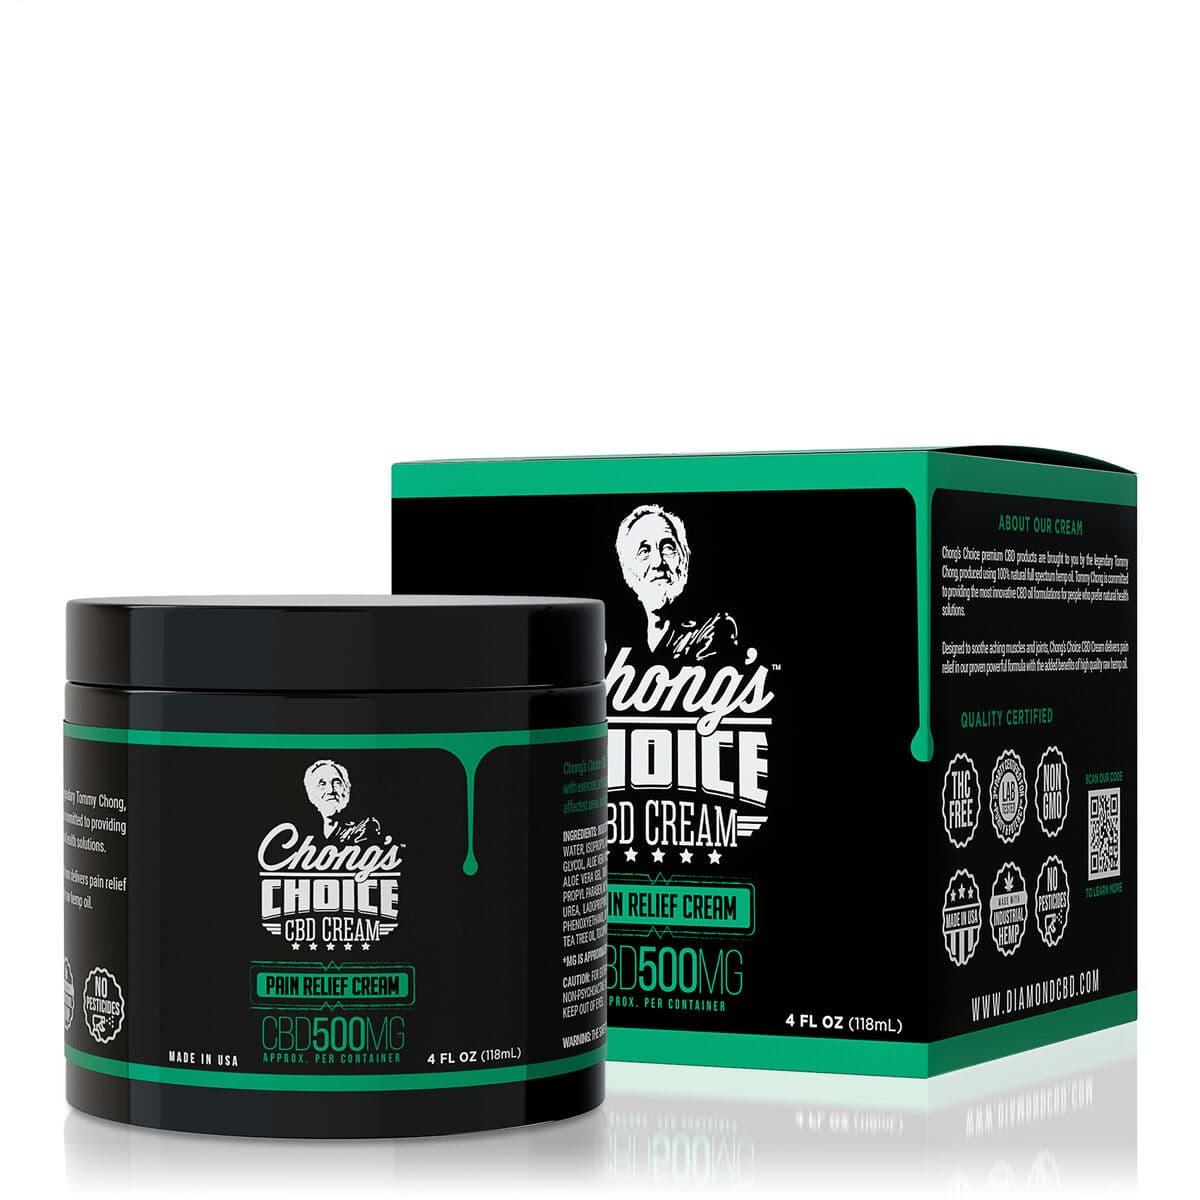 Chong's Choice, CBD Cream, Pain Relief, Broad Spectrum THC-Free, 4oz, 500mg CBD (1)